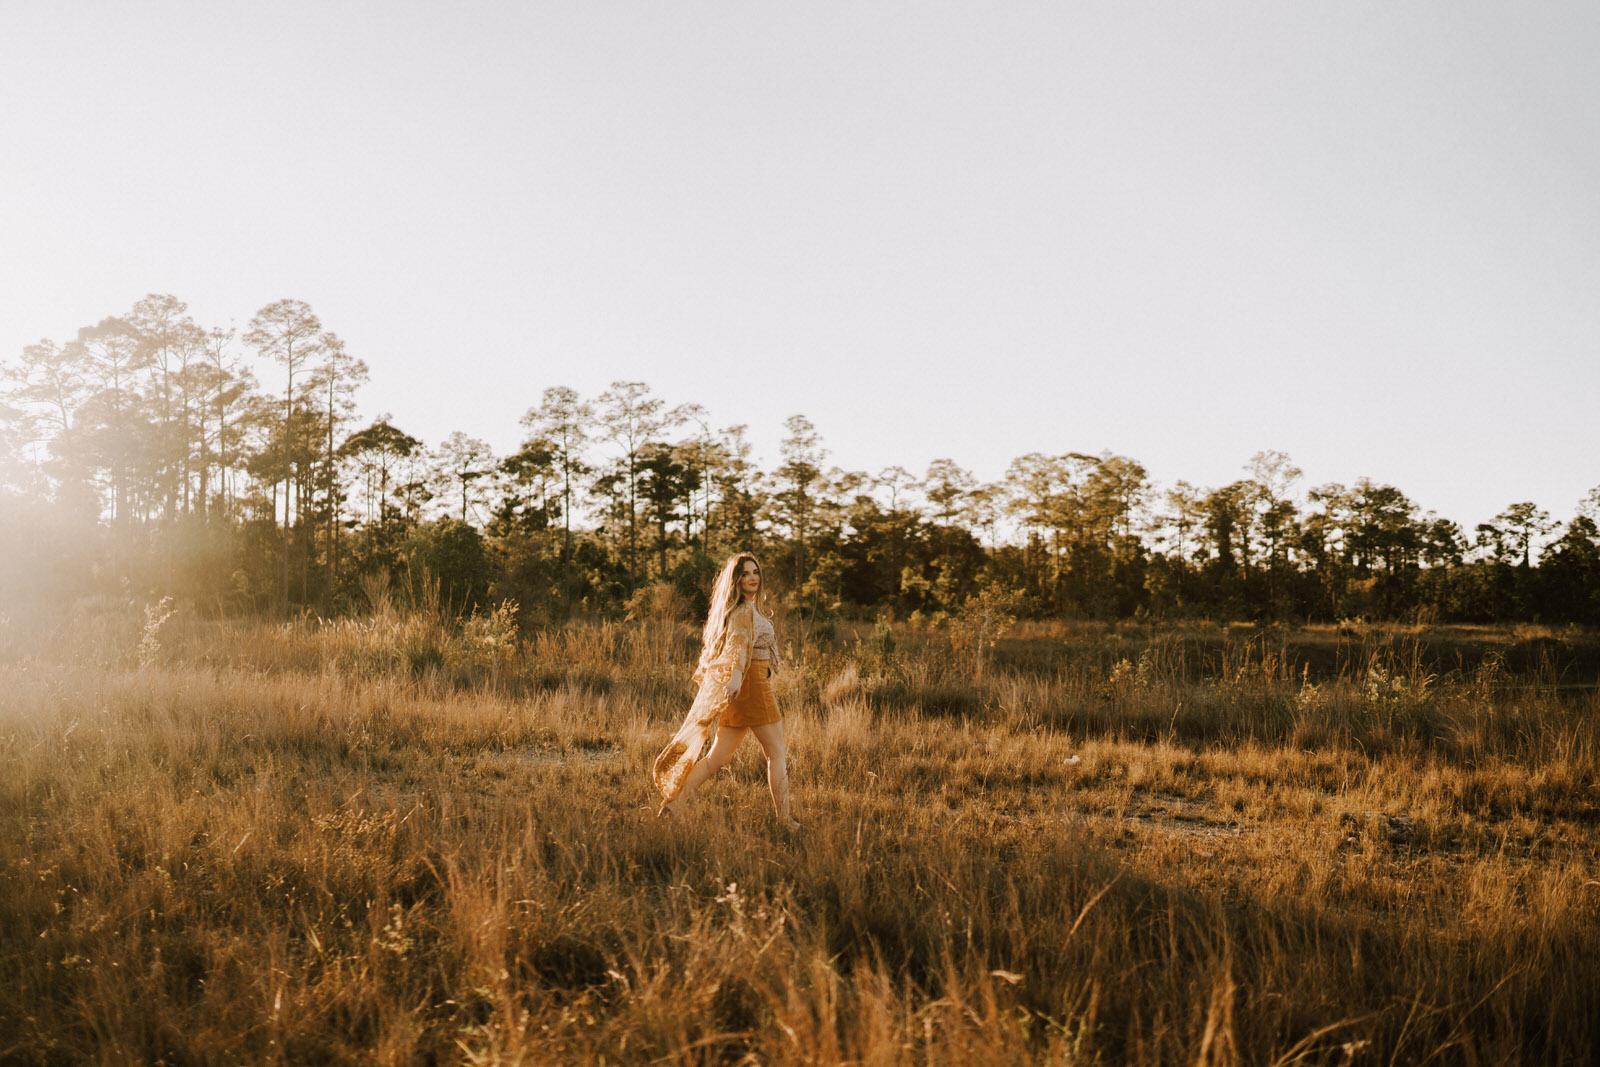 Fort Myers Senior Photos on a Field - Michelle Gonzalez Photography - Stephanie Blum-78.JPG